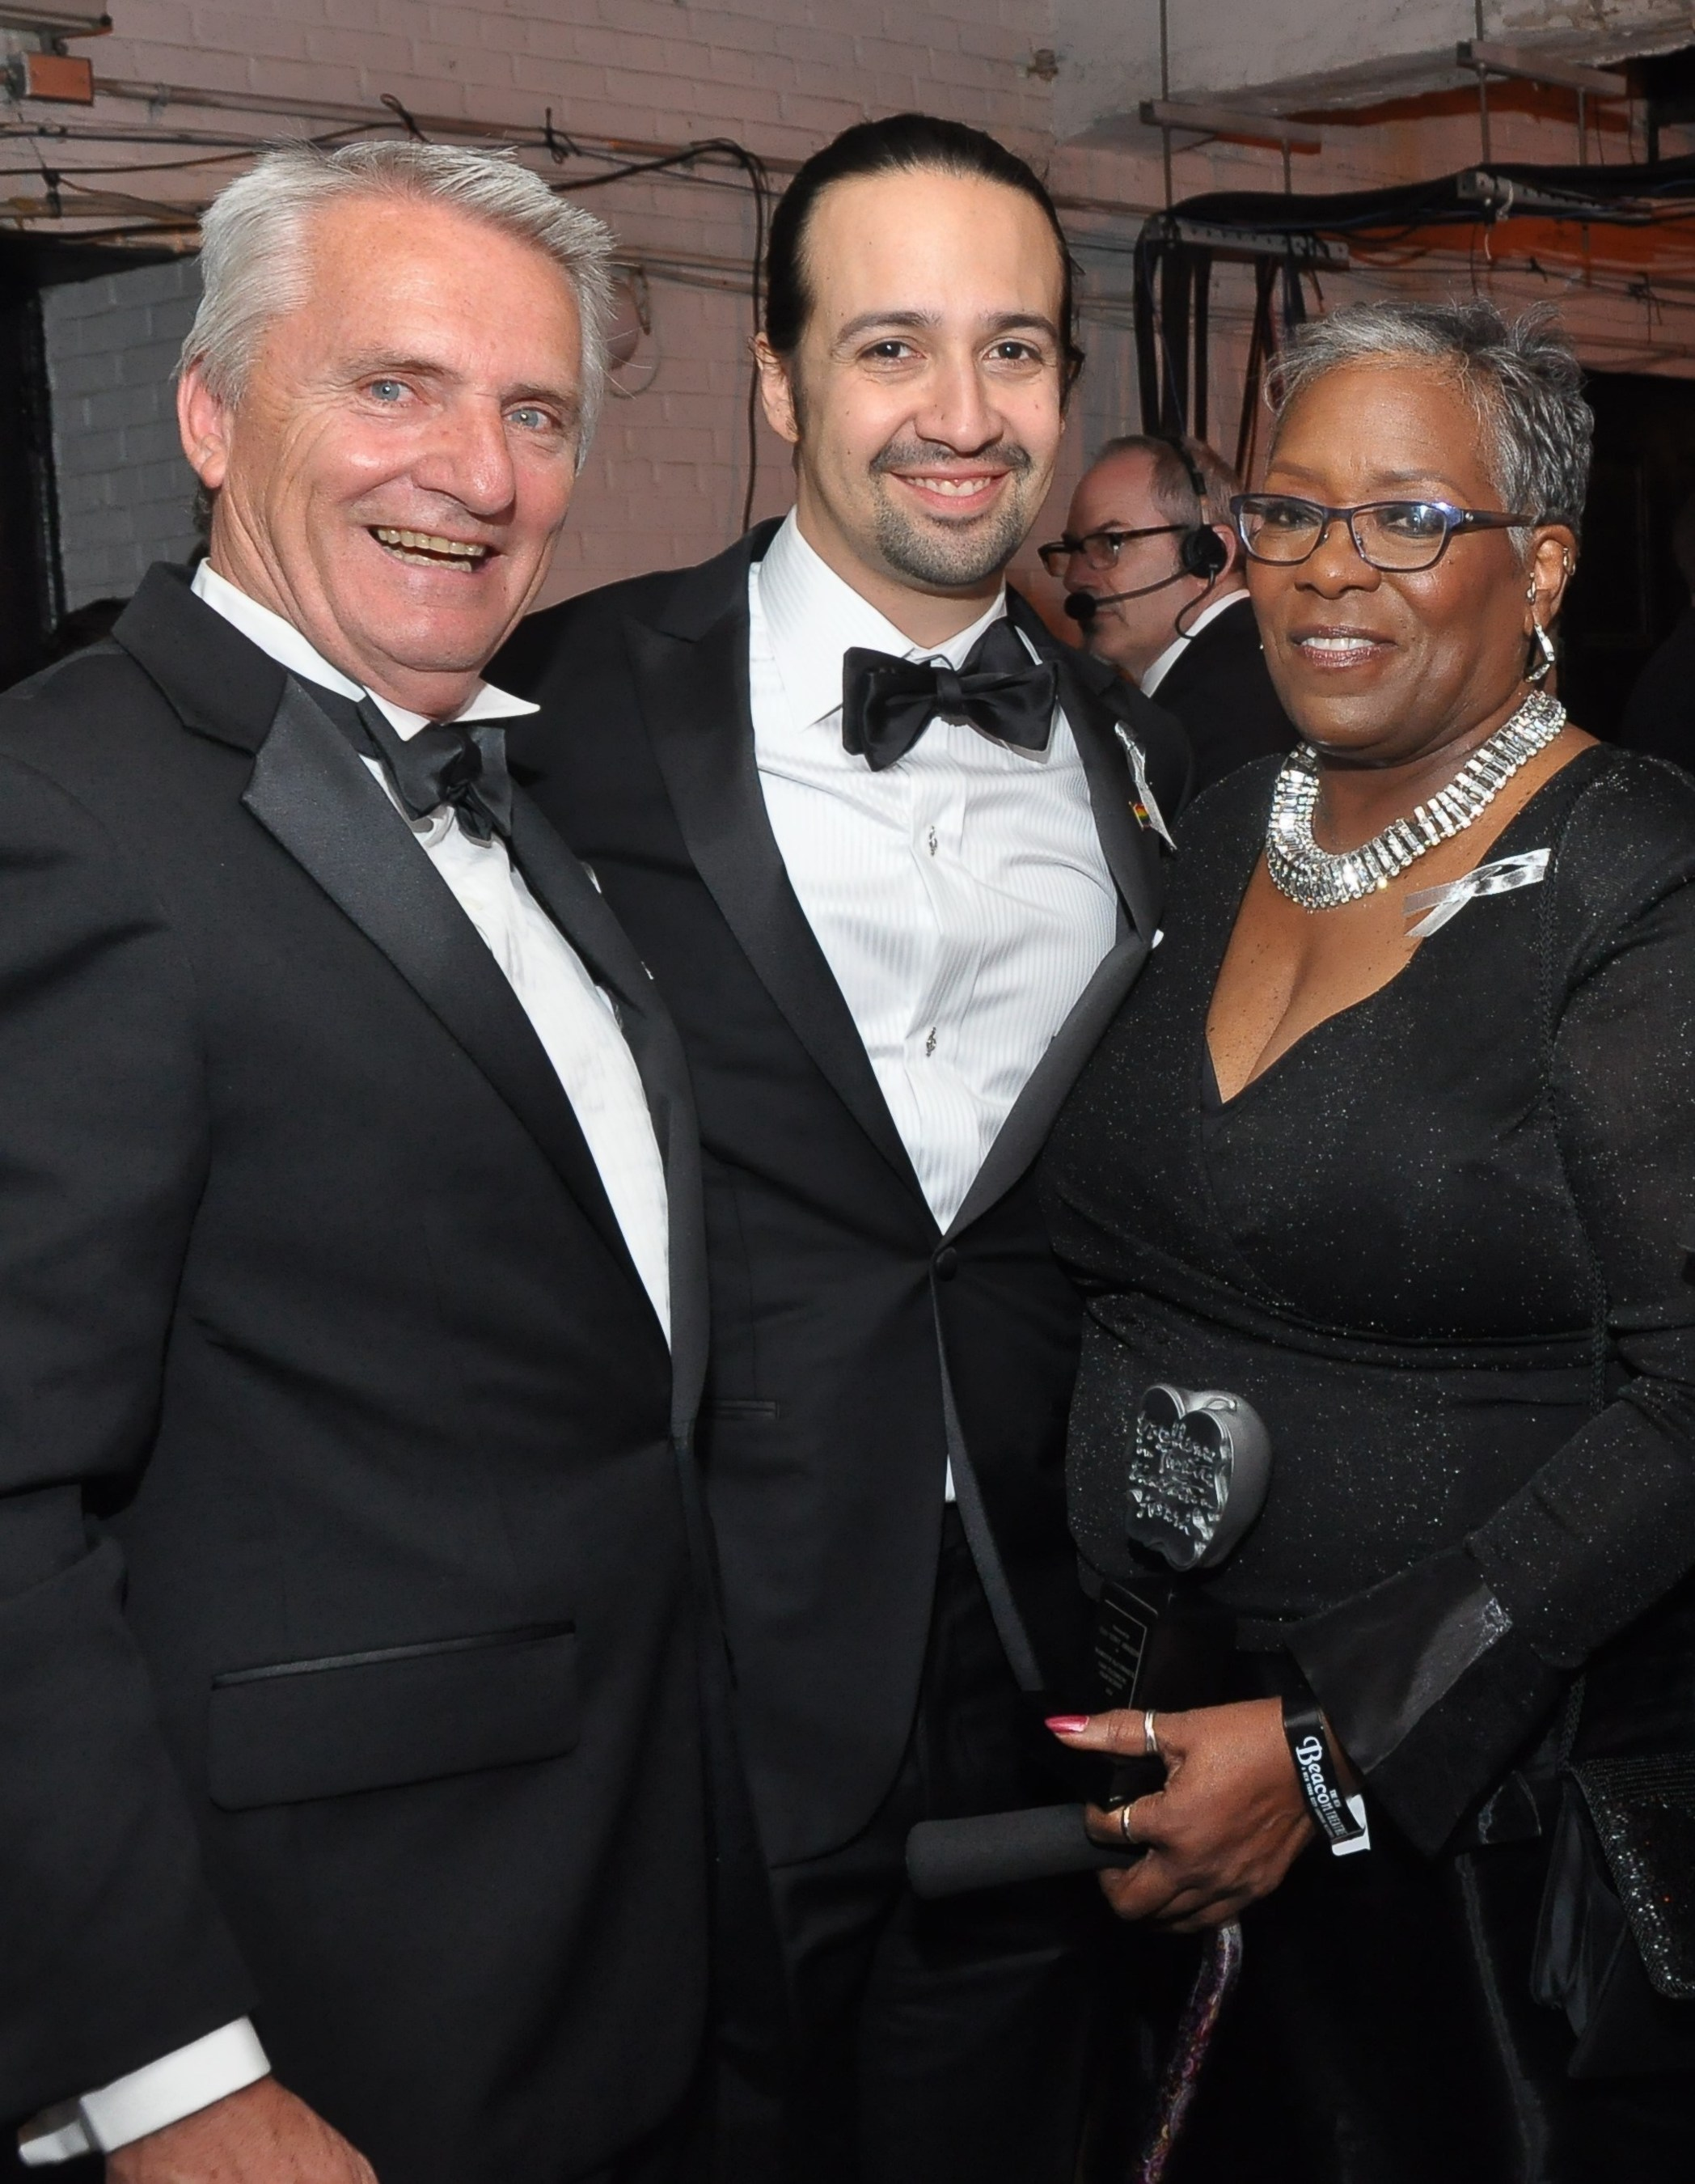 "Backstage at the 2016 Tony Awards, left to right: Carnegie Mellon University's Drama School Head, Dr. Peter Cooke; ""Hamilton"" creator and multiple Tony Awards winner, Lin-Manuel Miranda; and 2016 Excellence in Theatre Education Award winner, Marilyn McCormick. (Photo credit: Tony Awards)"